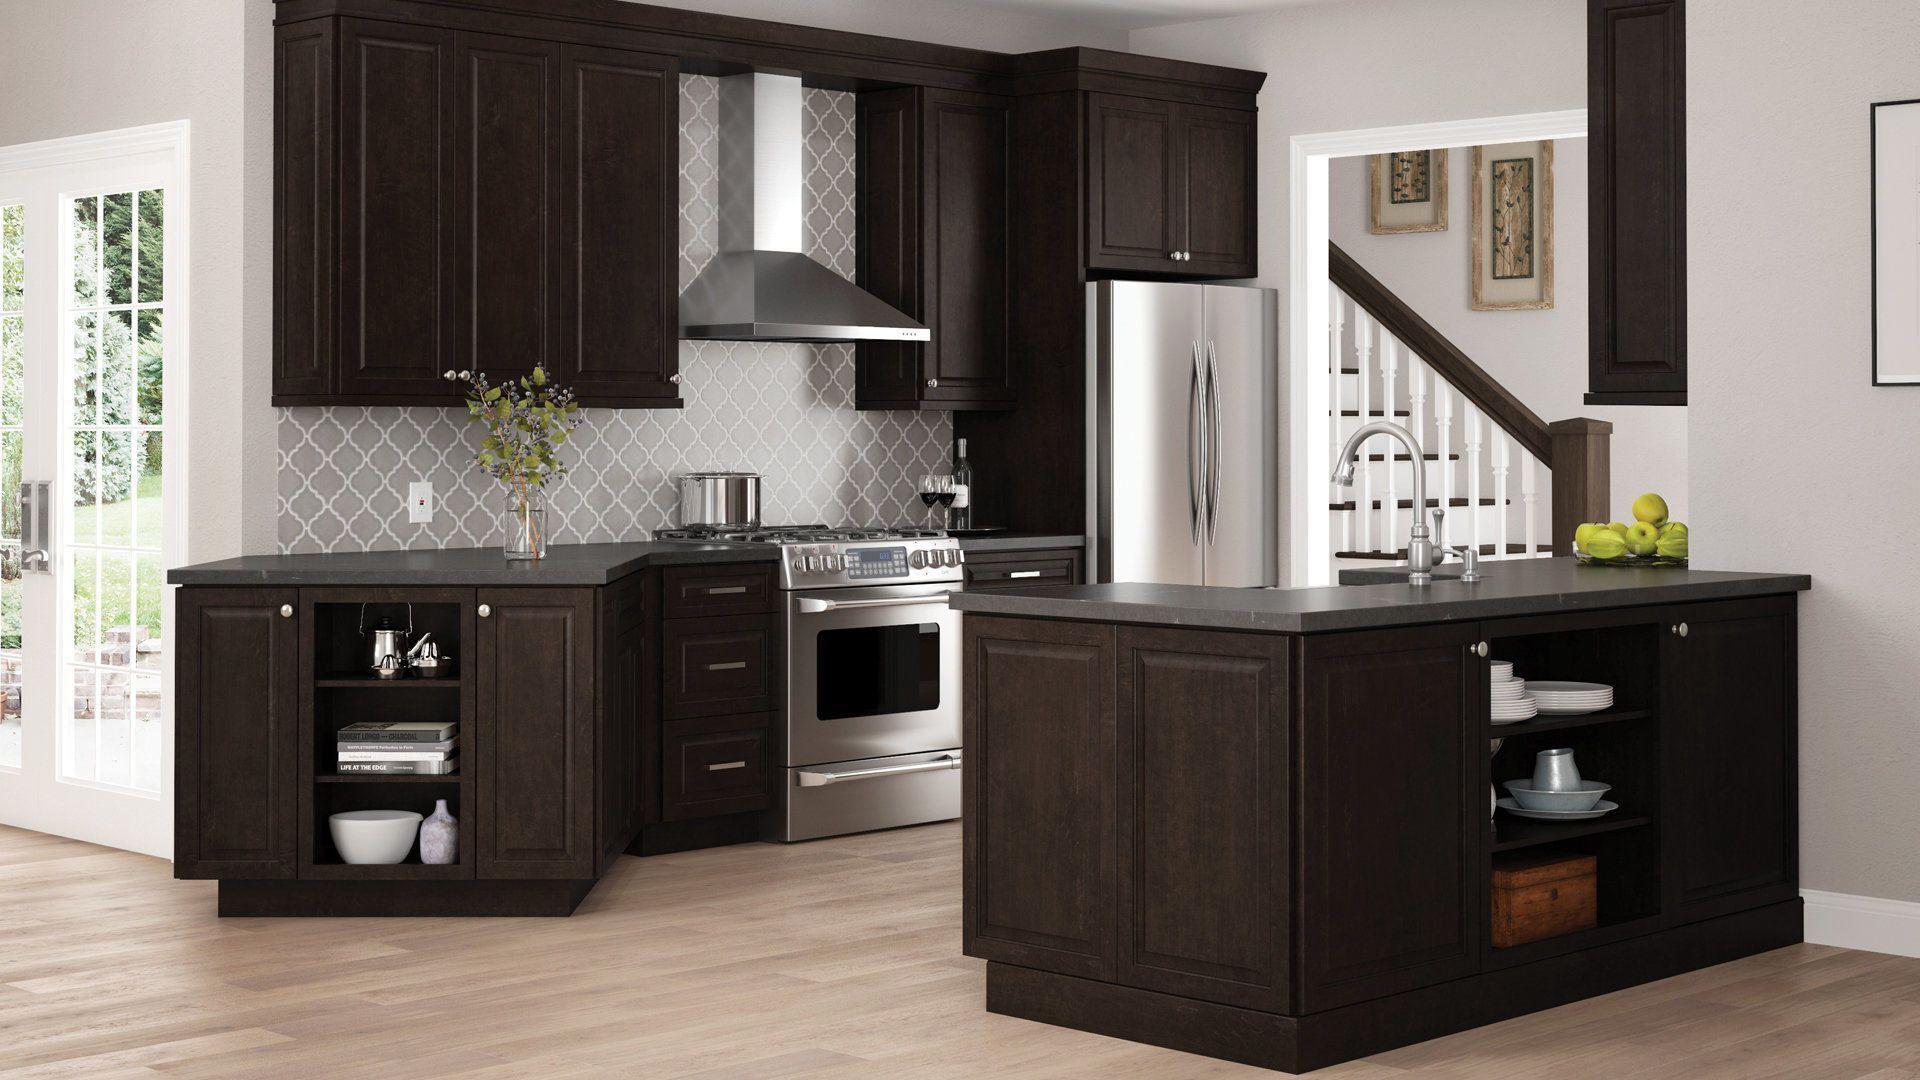 Gretna Wall Cabinets In Espresso Kitchen The Home Depot In 2020 Home Depot Kitchen Espresso Kitchen Cabinets Kitchen Set Cabinet